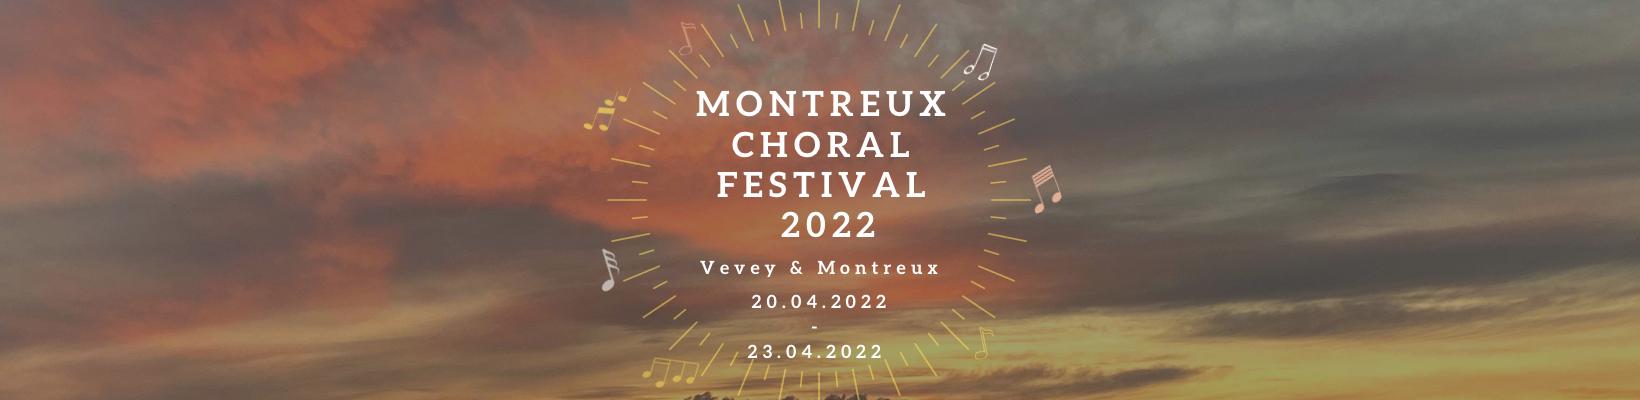 Montreux Choral Festival 2022